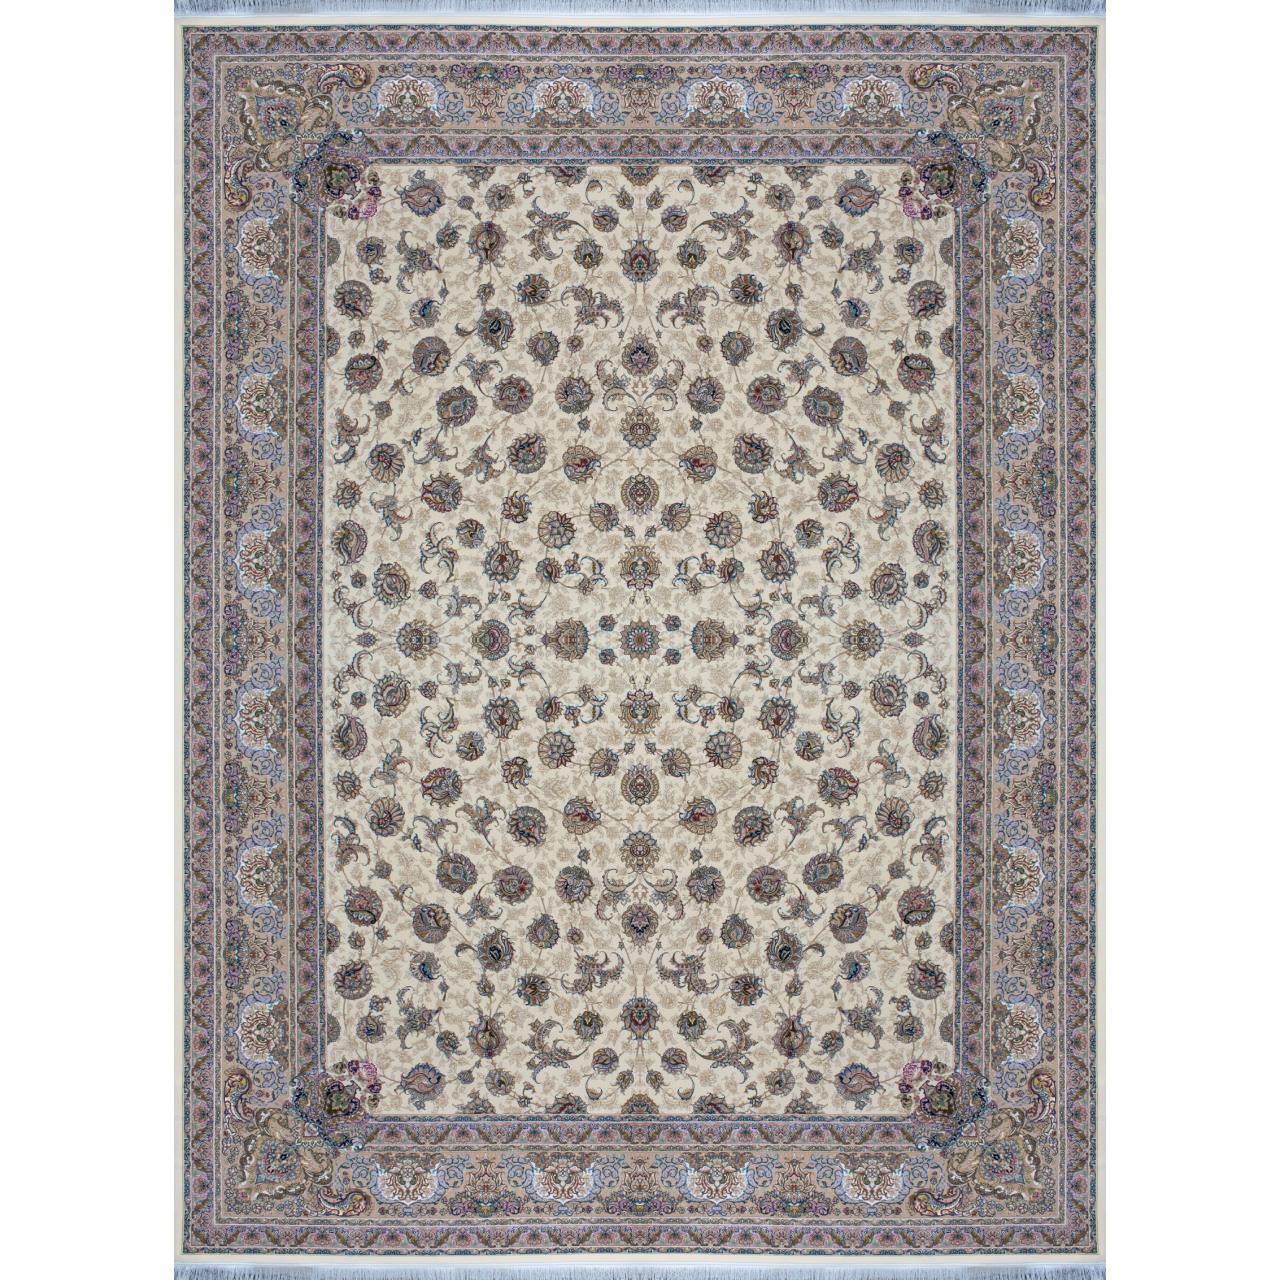 فرش ماشینی کد afrand_24850 زمینه موزی